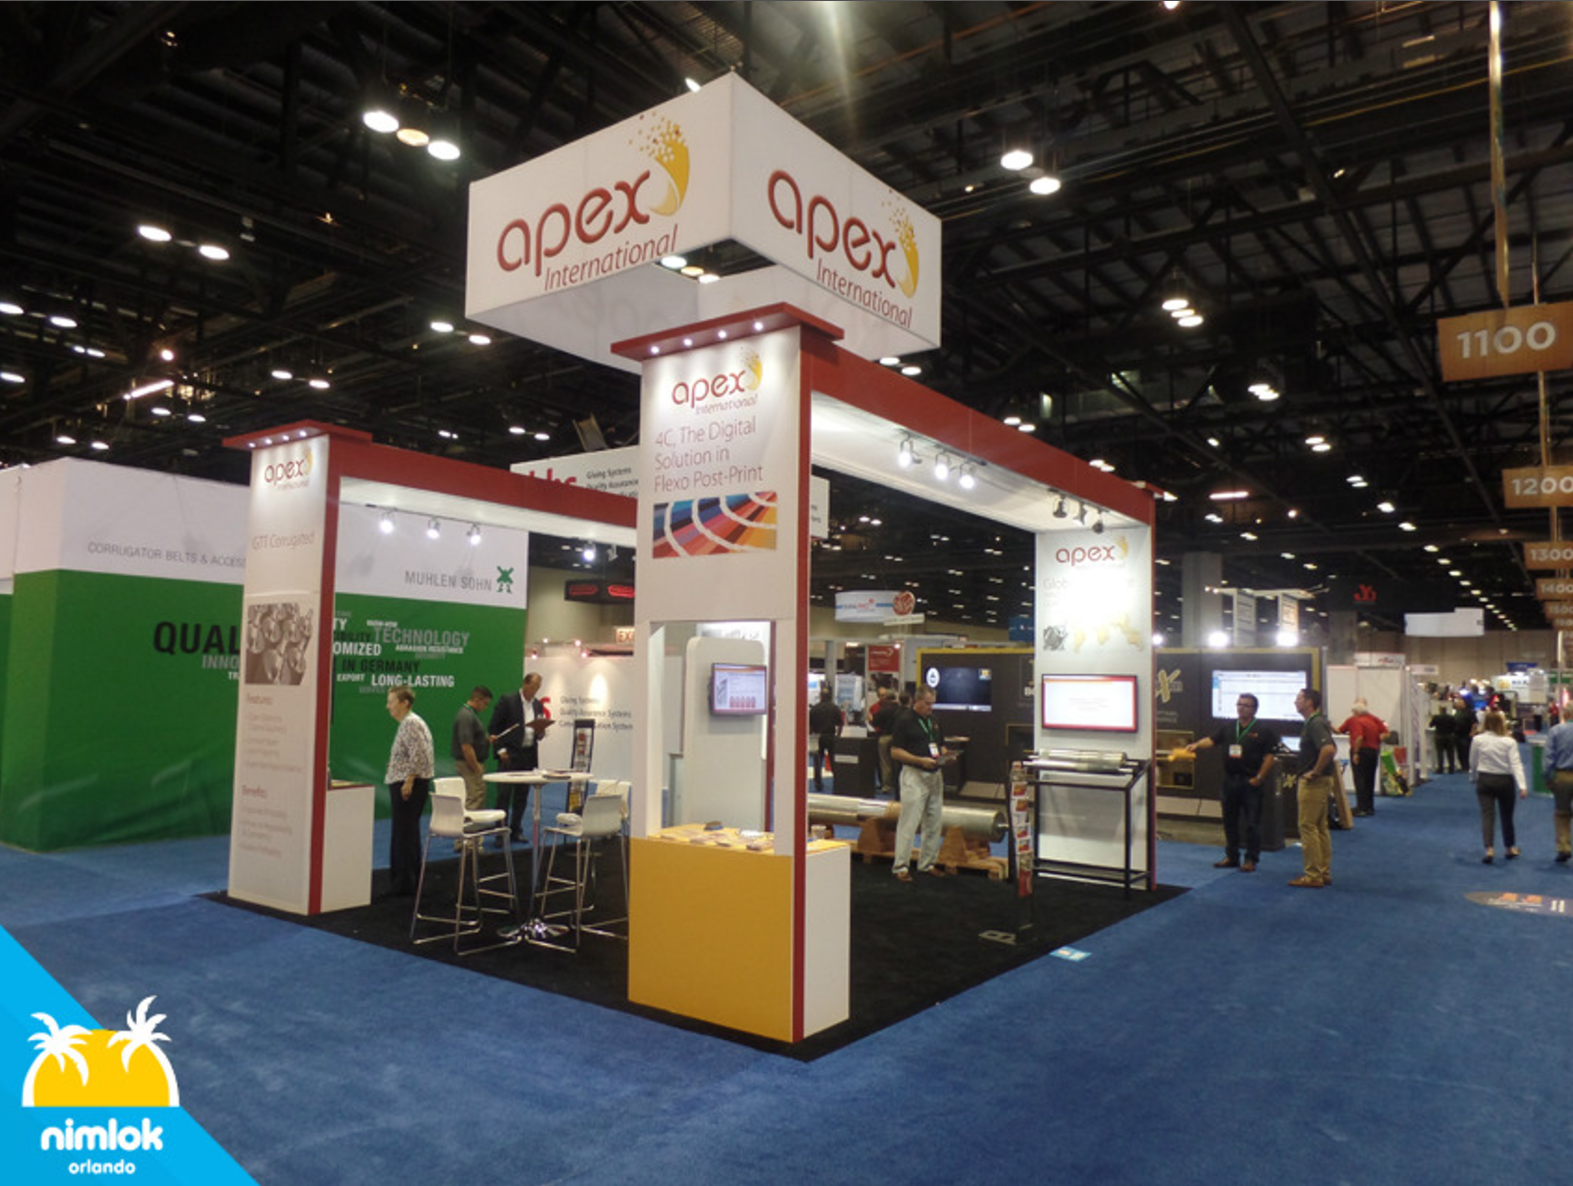 Exhibition Stands In Orlando : Apex international custom trade show booth exhibit